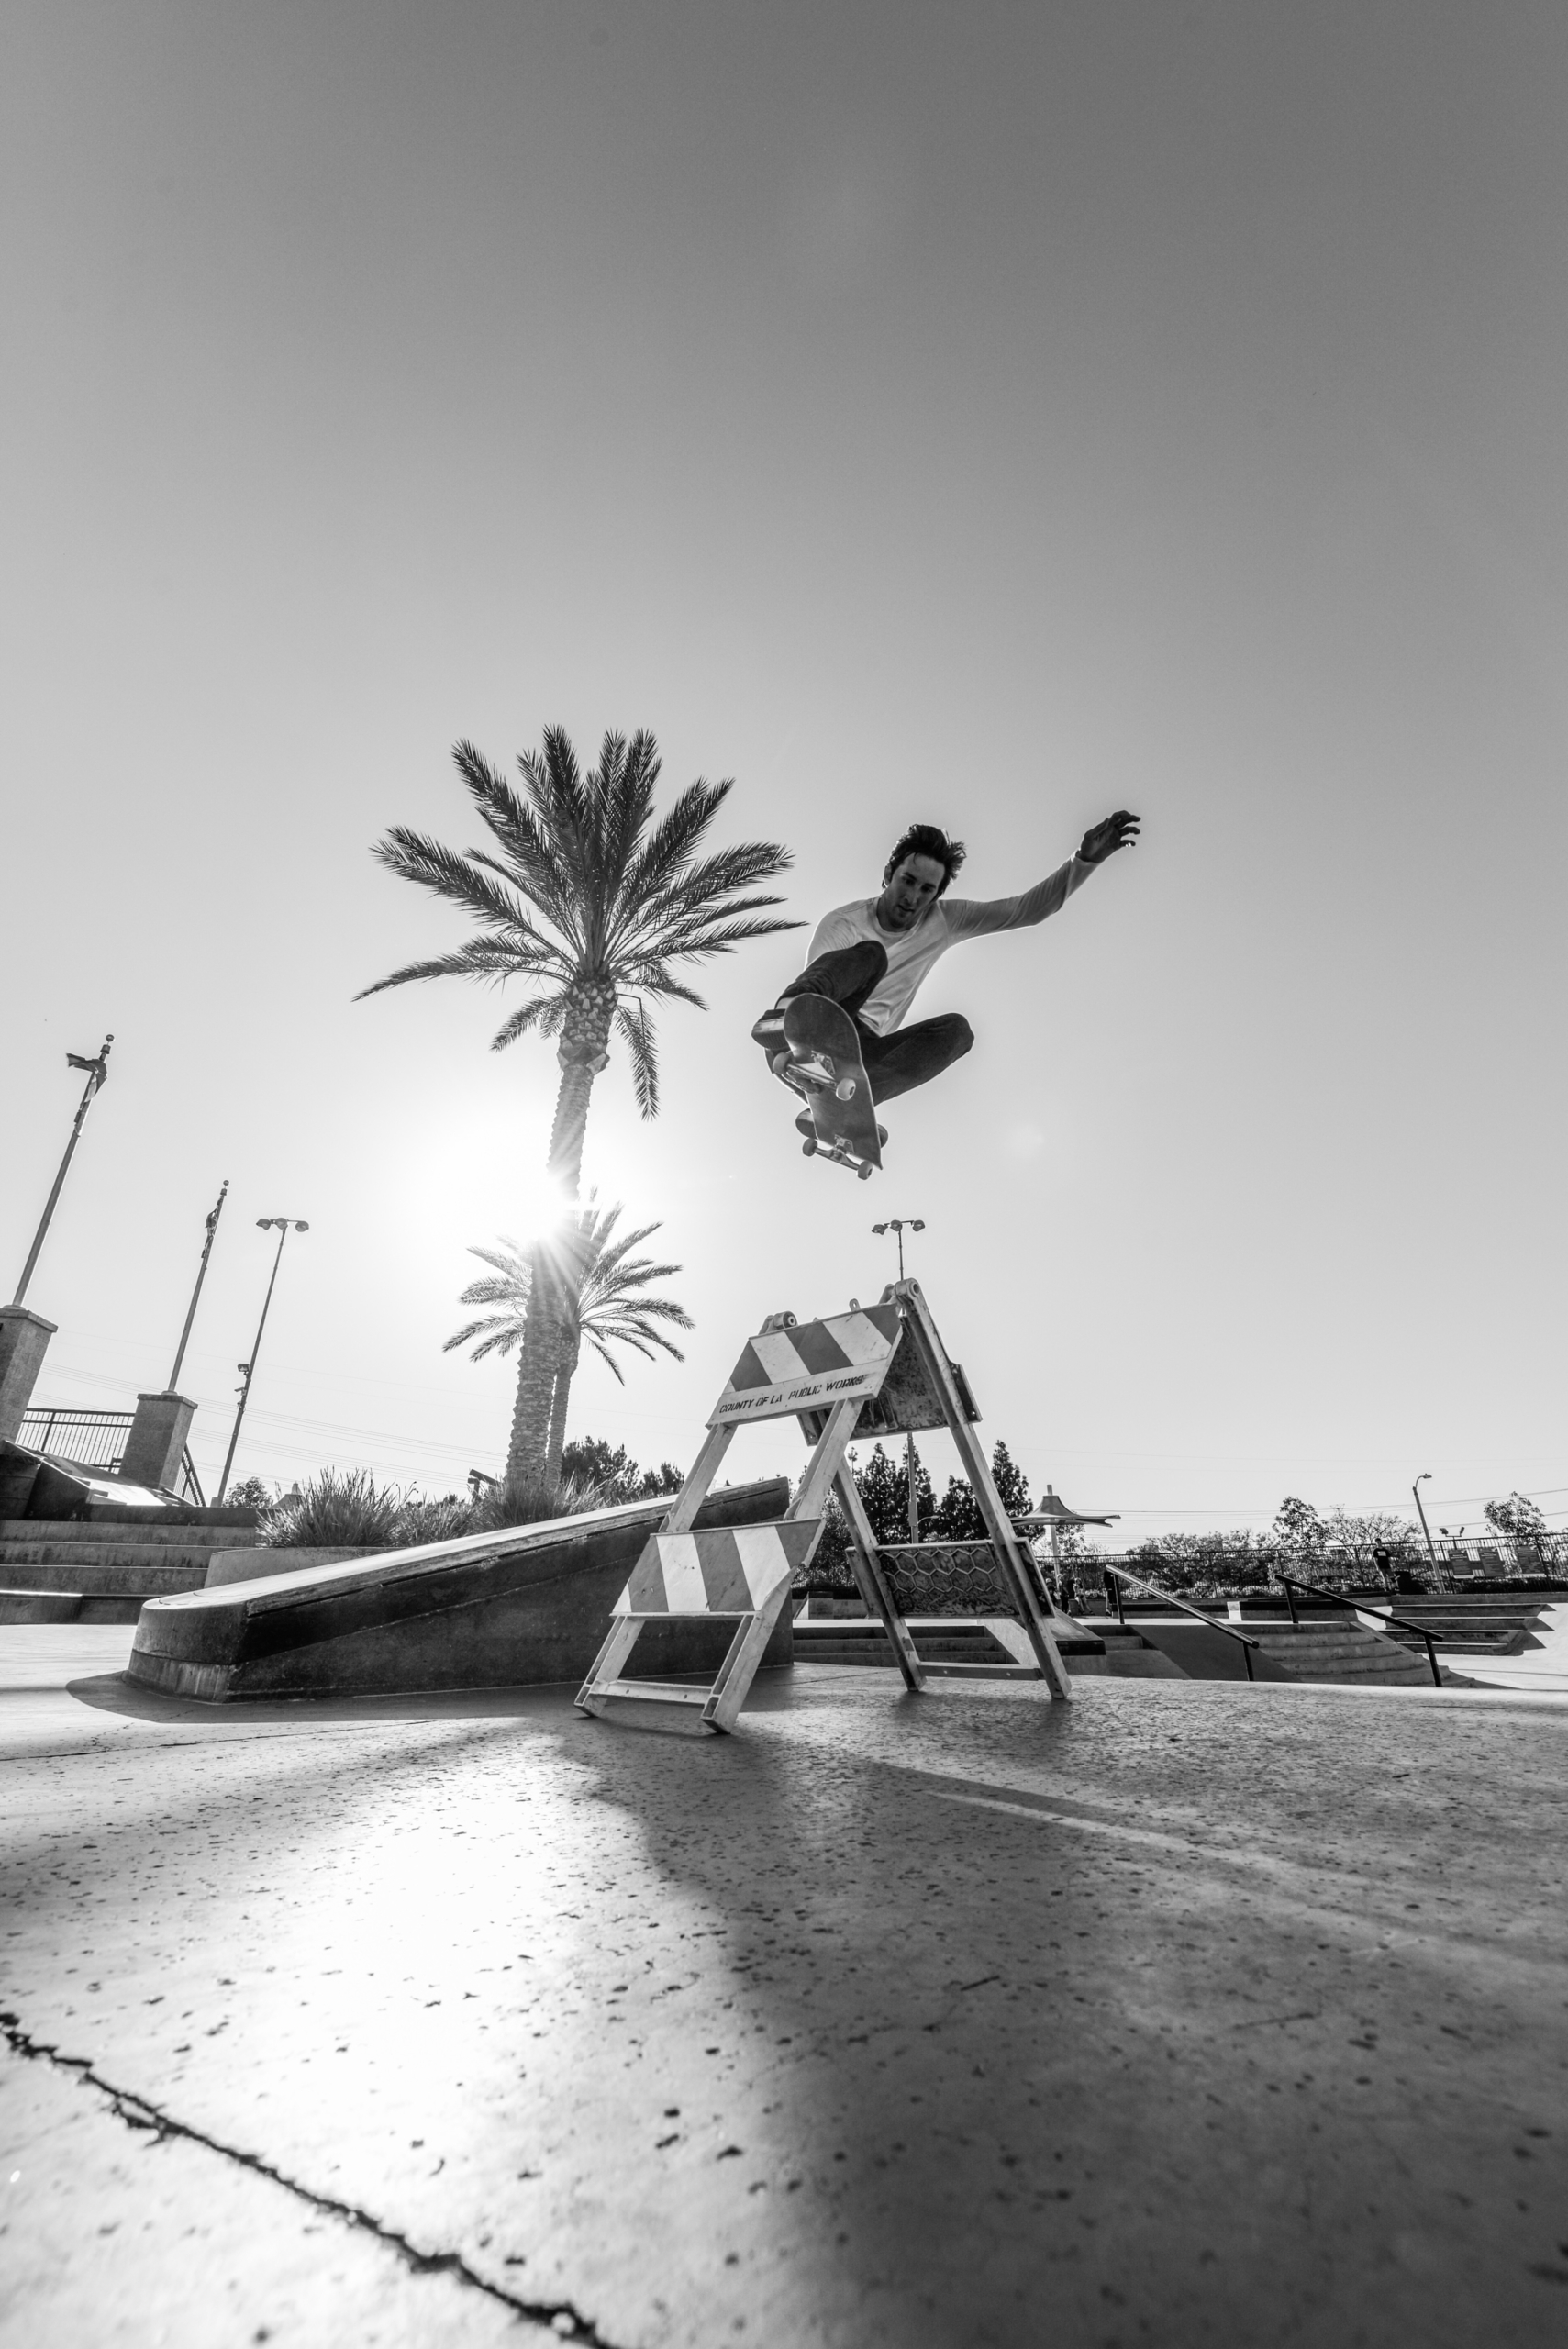 Skate Park / Garrett - blackandwhite - ben-staley | ello